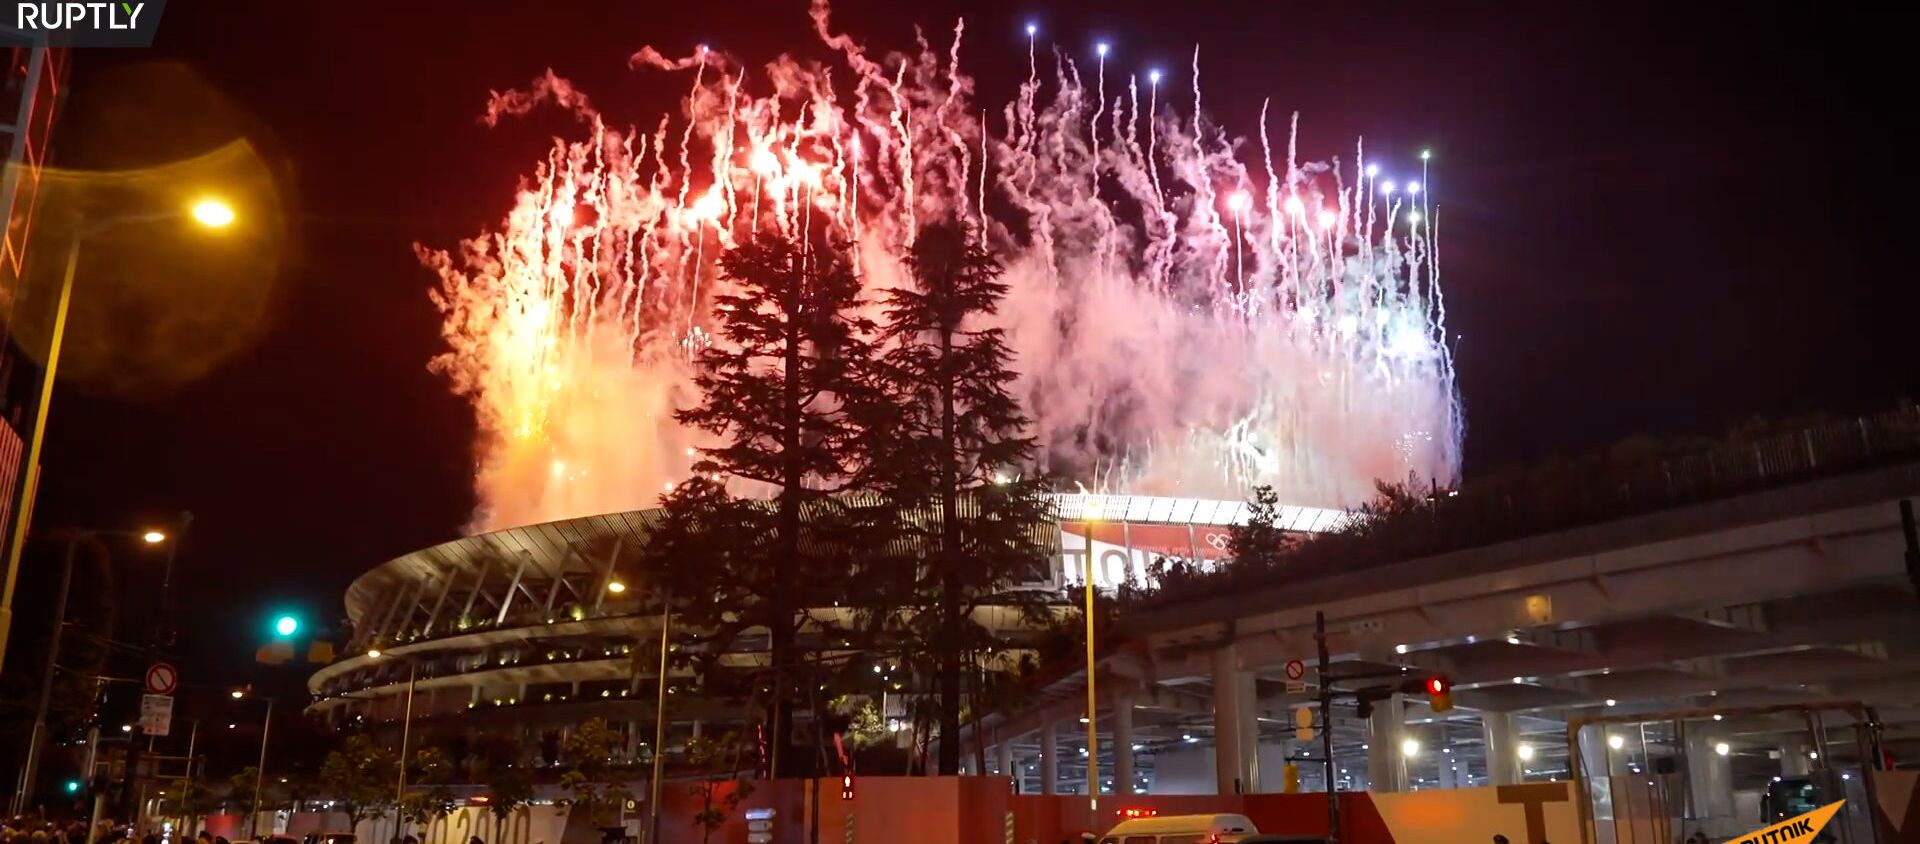 Фейерверк над Олимпийским стадионом в Токио во время церемонии закрытия XXXII летней Олимпиады - Sputnik Արմենիա, 1920, 08.08.2021